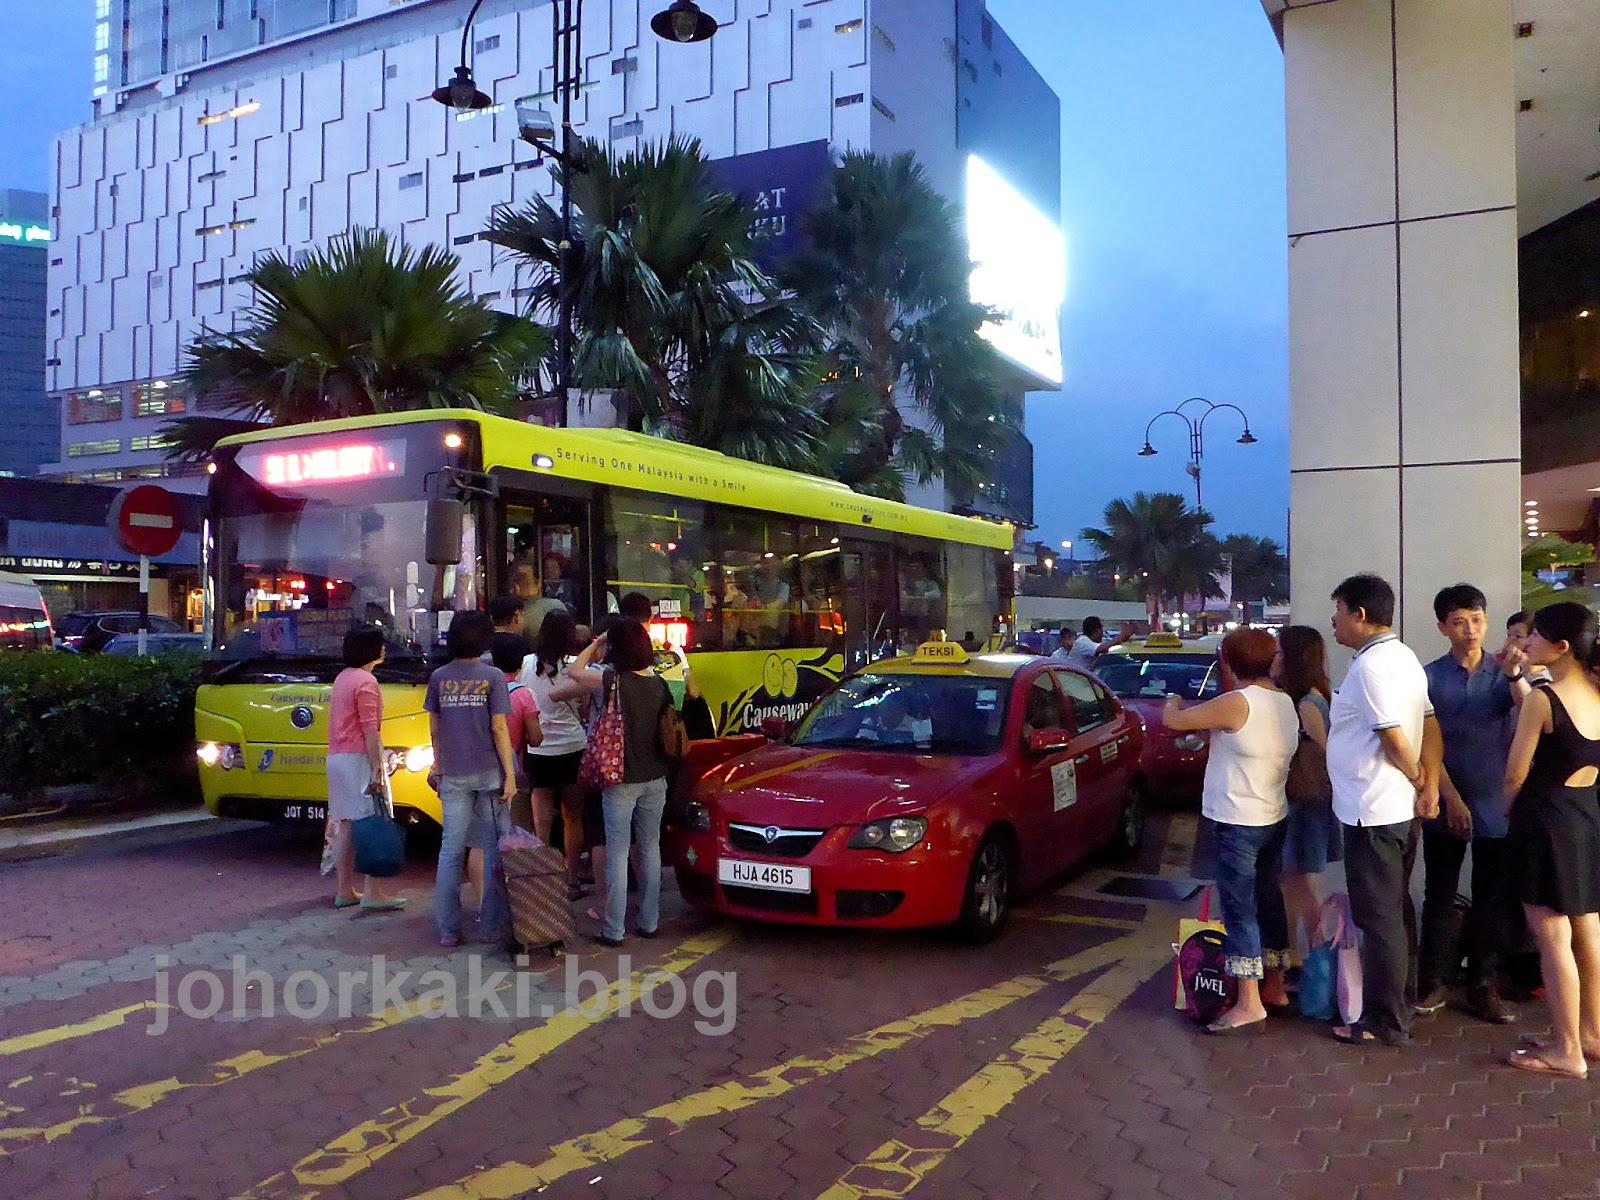 Singapore to Malaysia - travel guide on Malaysia and Singapore